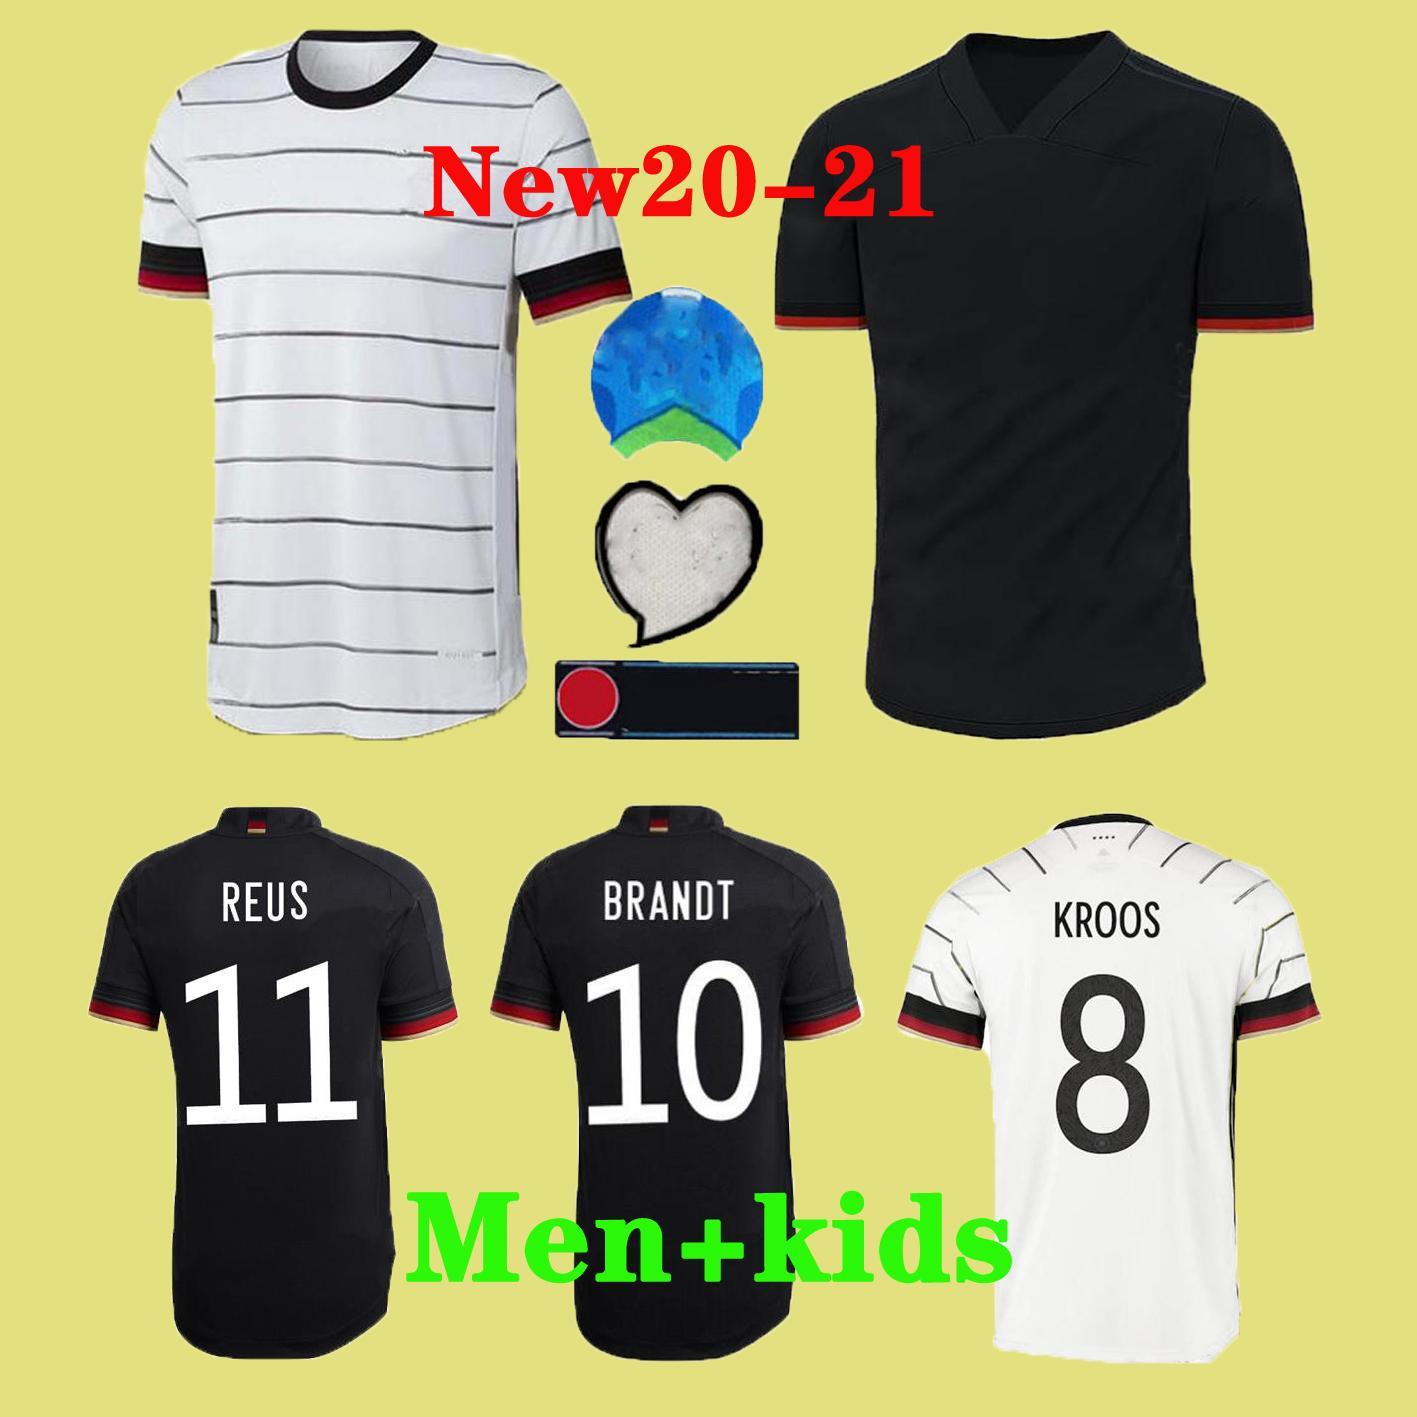 2020 Almanya Euro Futbol Forma REUS Ev kiti Hummels Kroos MULLER Götze Futbol Gömlek HAVERTZ Mens Jersey Çocuk kiti